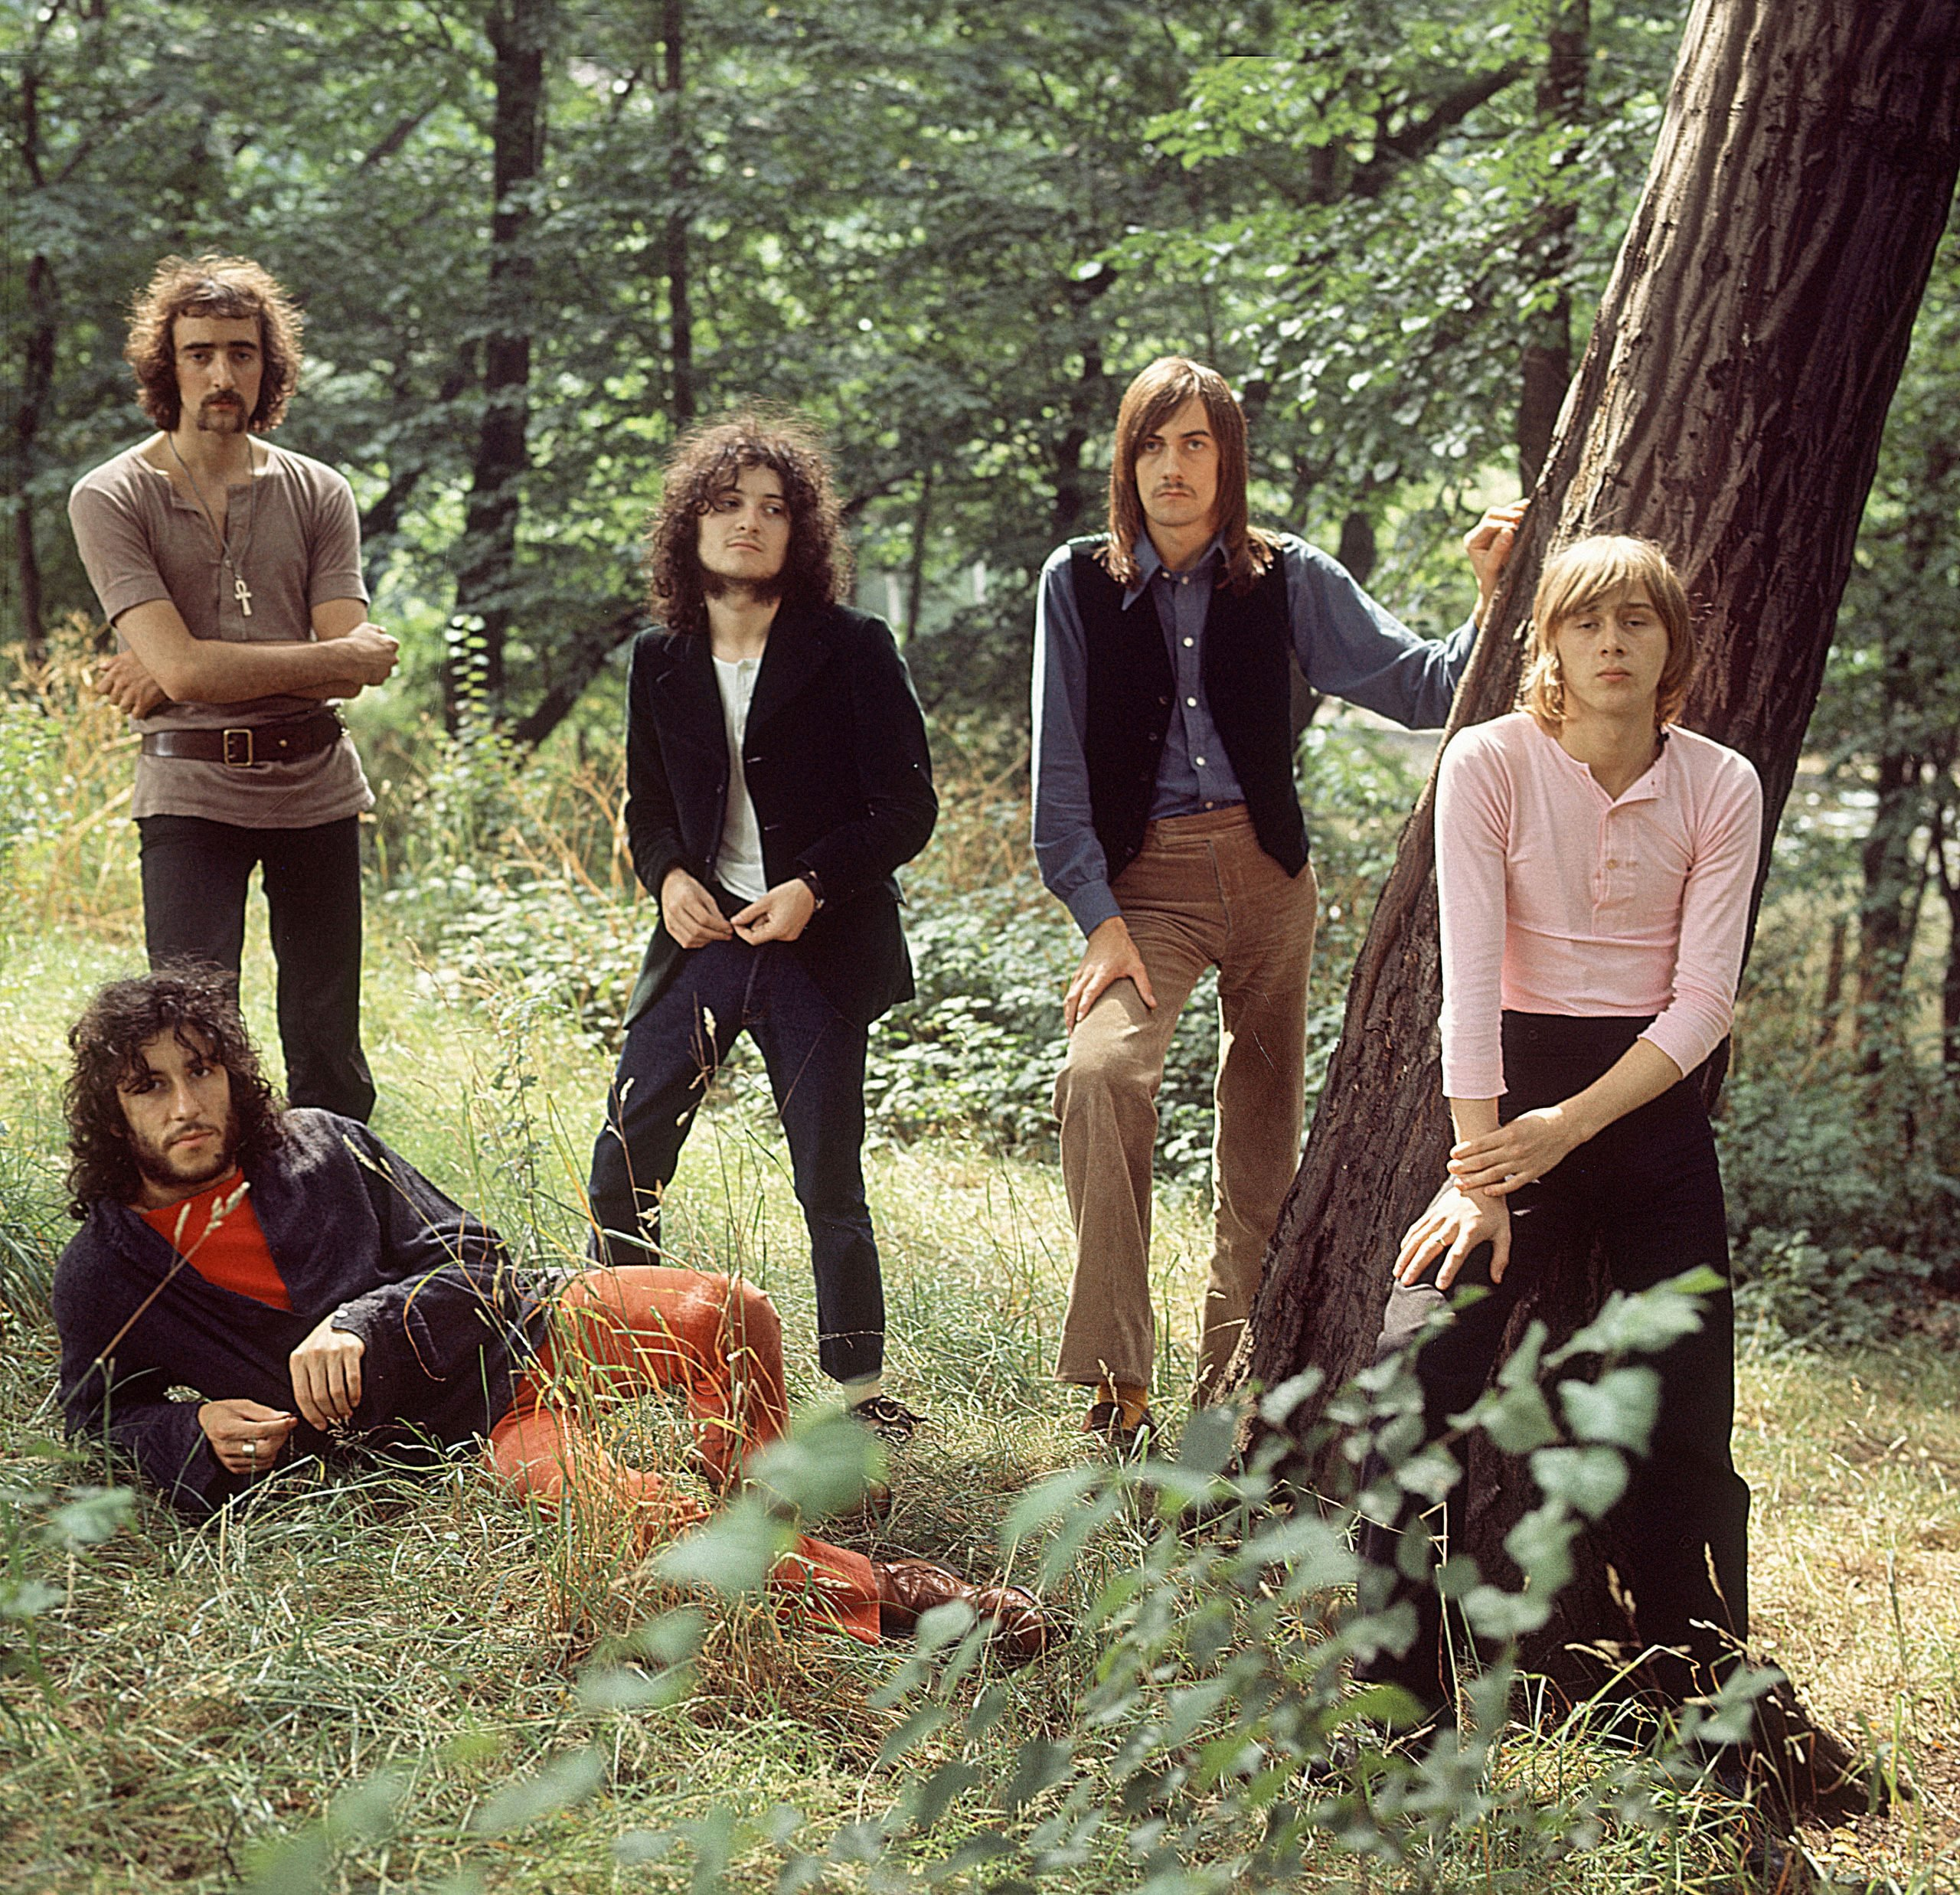 Fleetwood Mac Live in Finland 1969